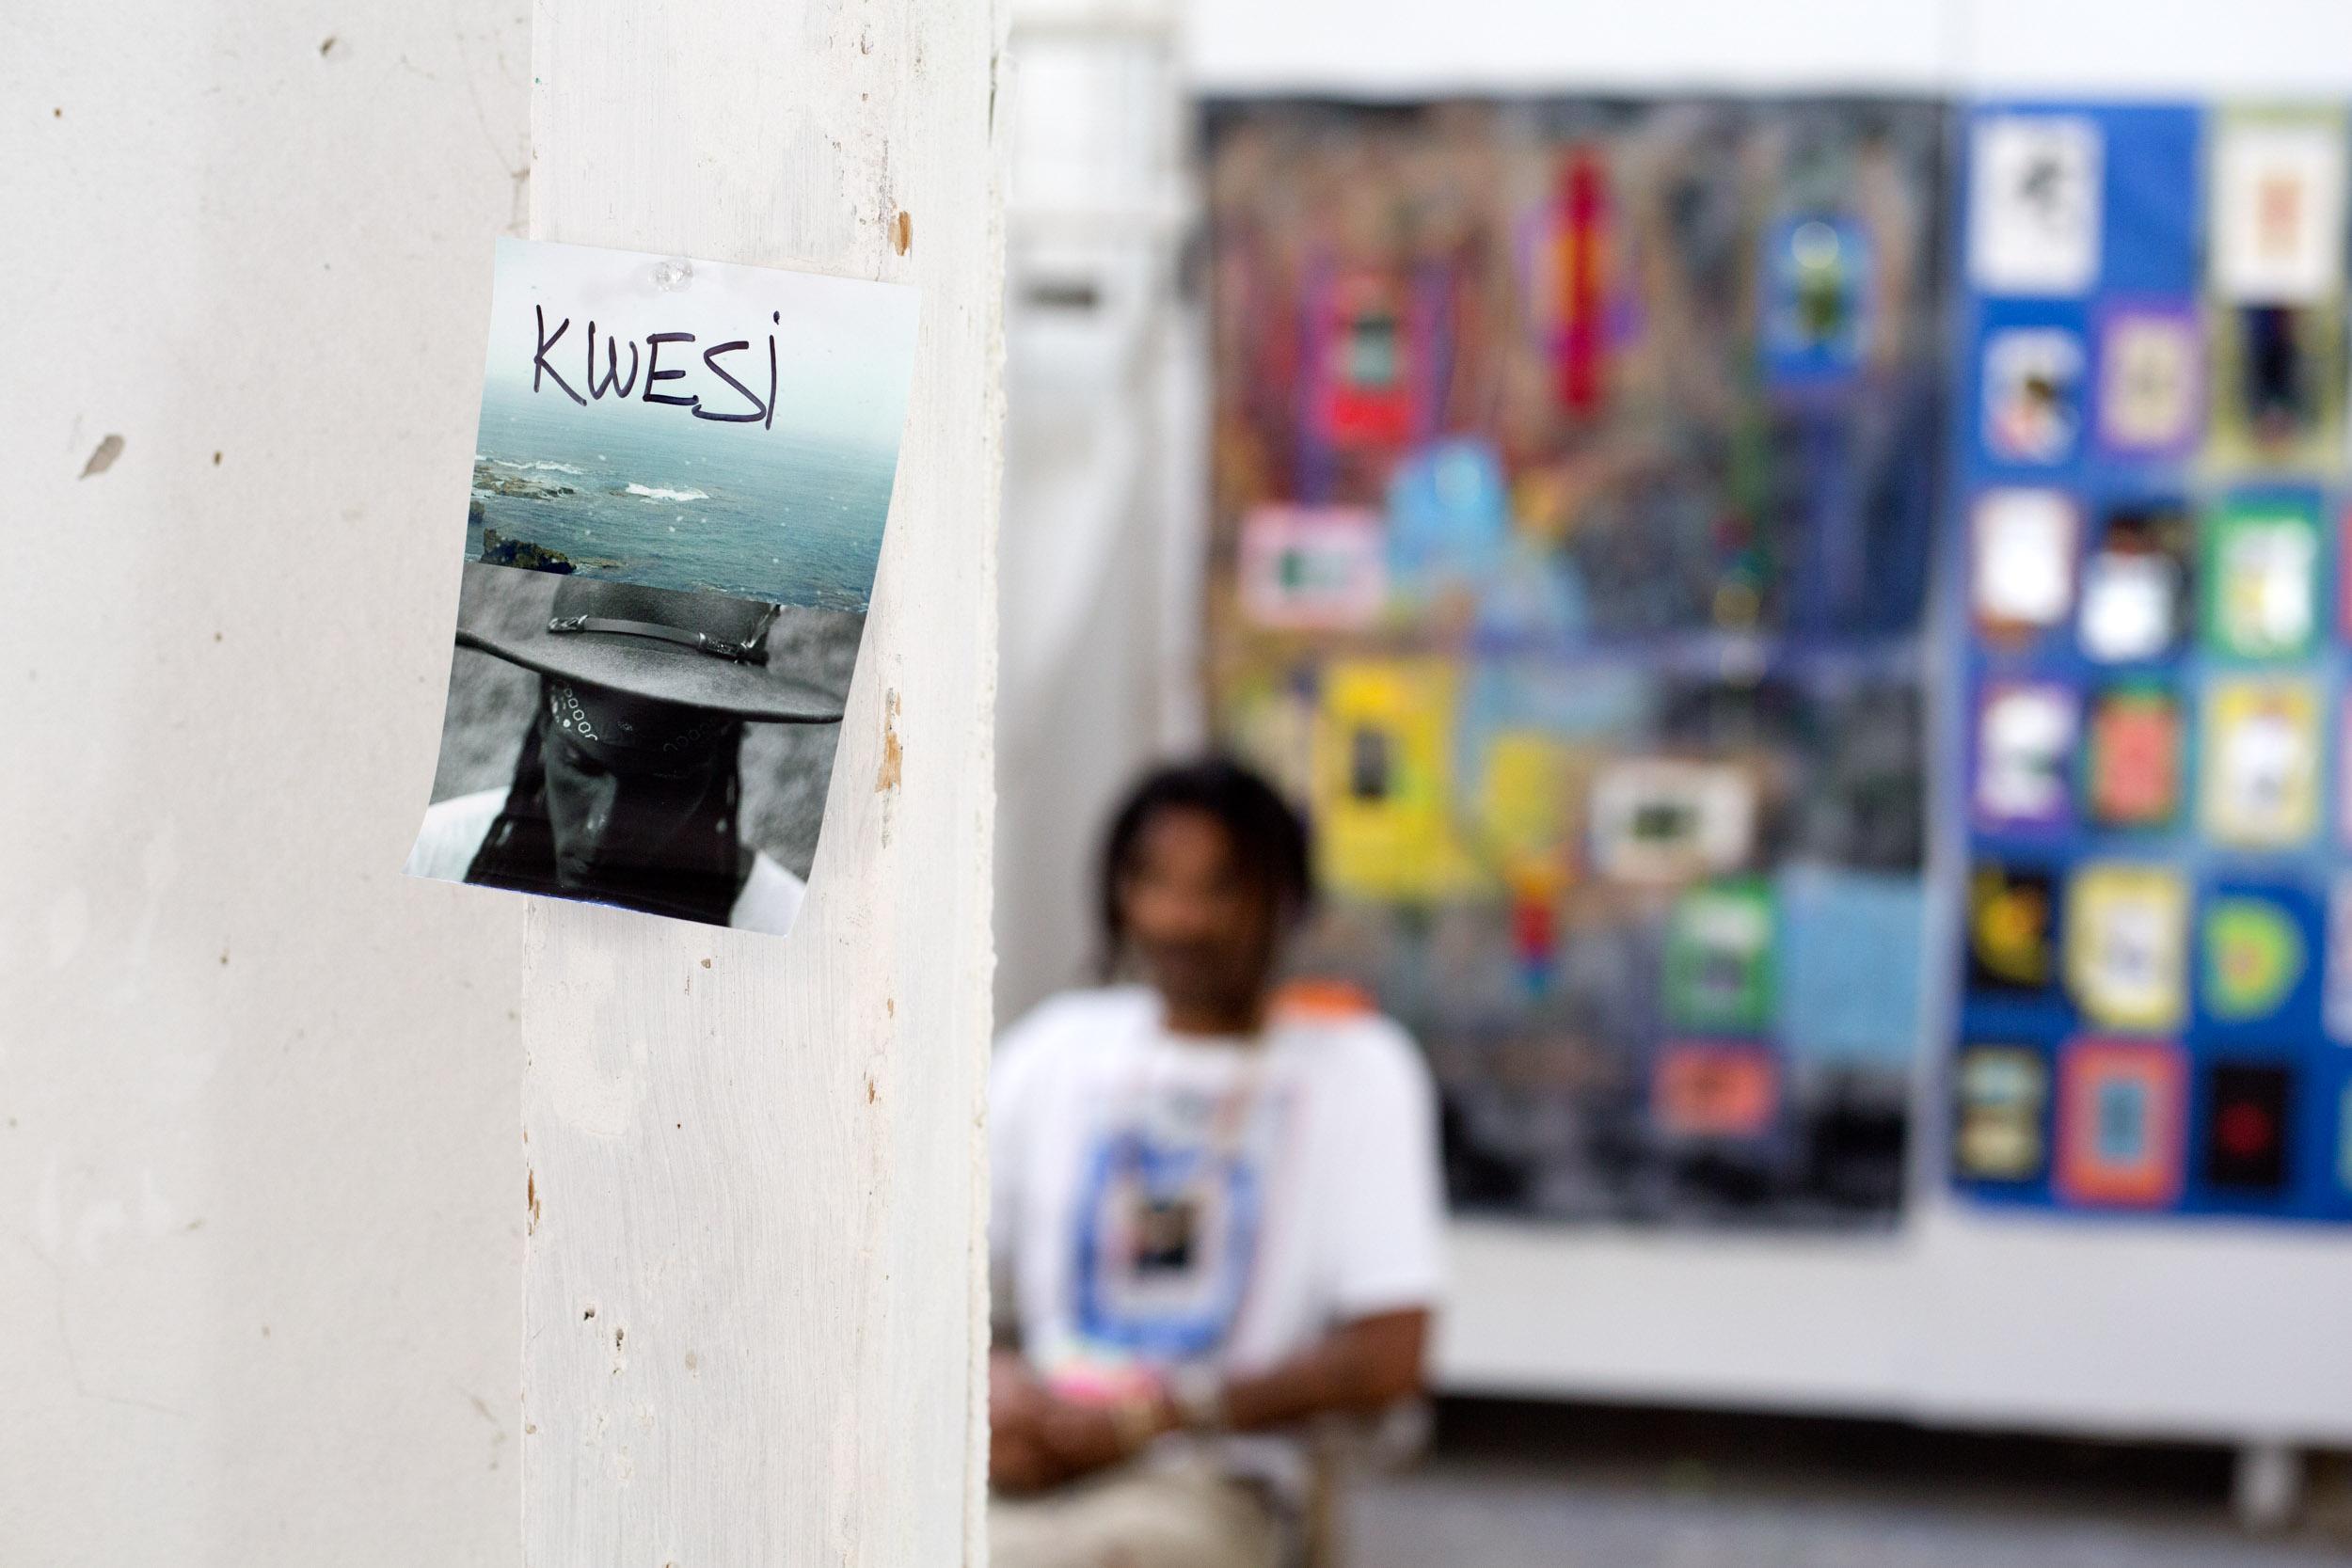 wassaic-project-artist-kwesi-abbensetts-2018-09-13-11-18-16.jpg